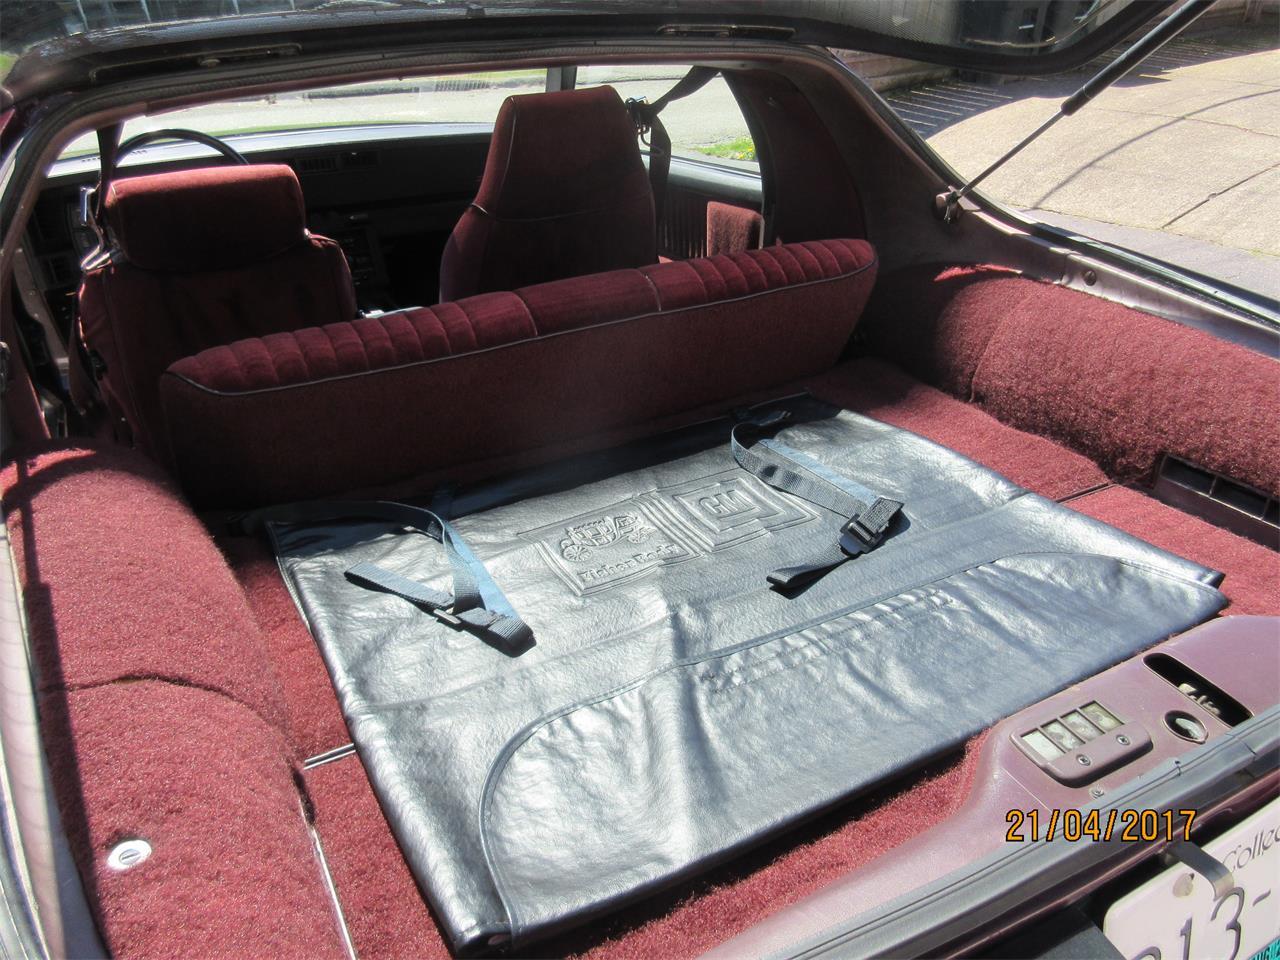 Large Picture of '82 Camaro Z28 located in British Columbia - $15,000.00 - L3IA